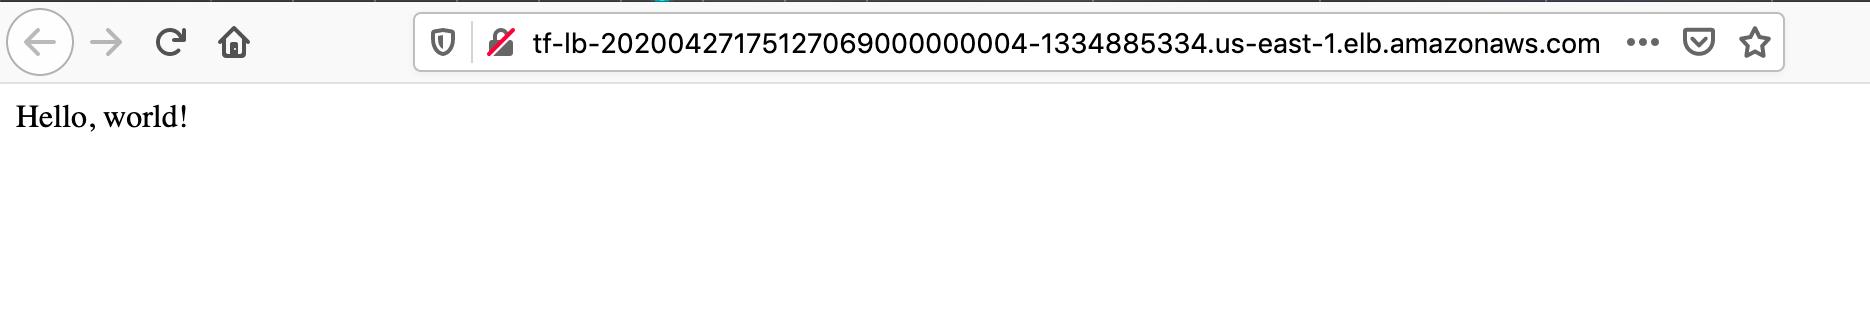 Hello world application screenshot